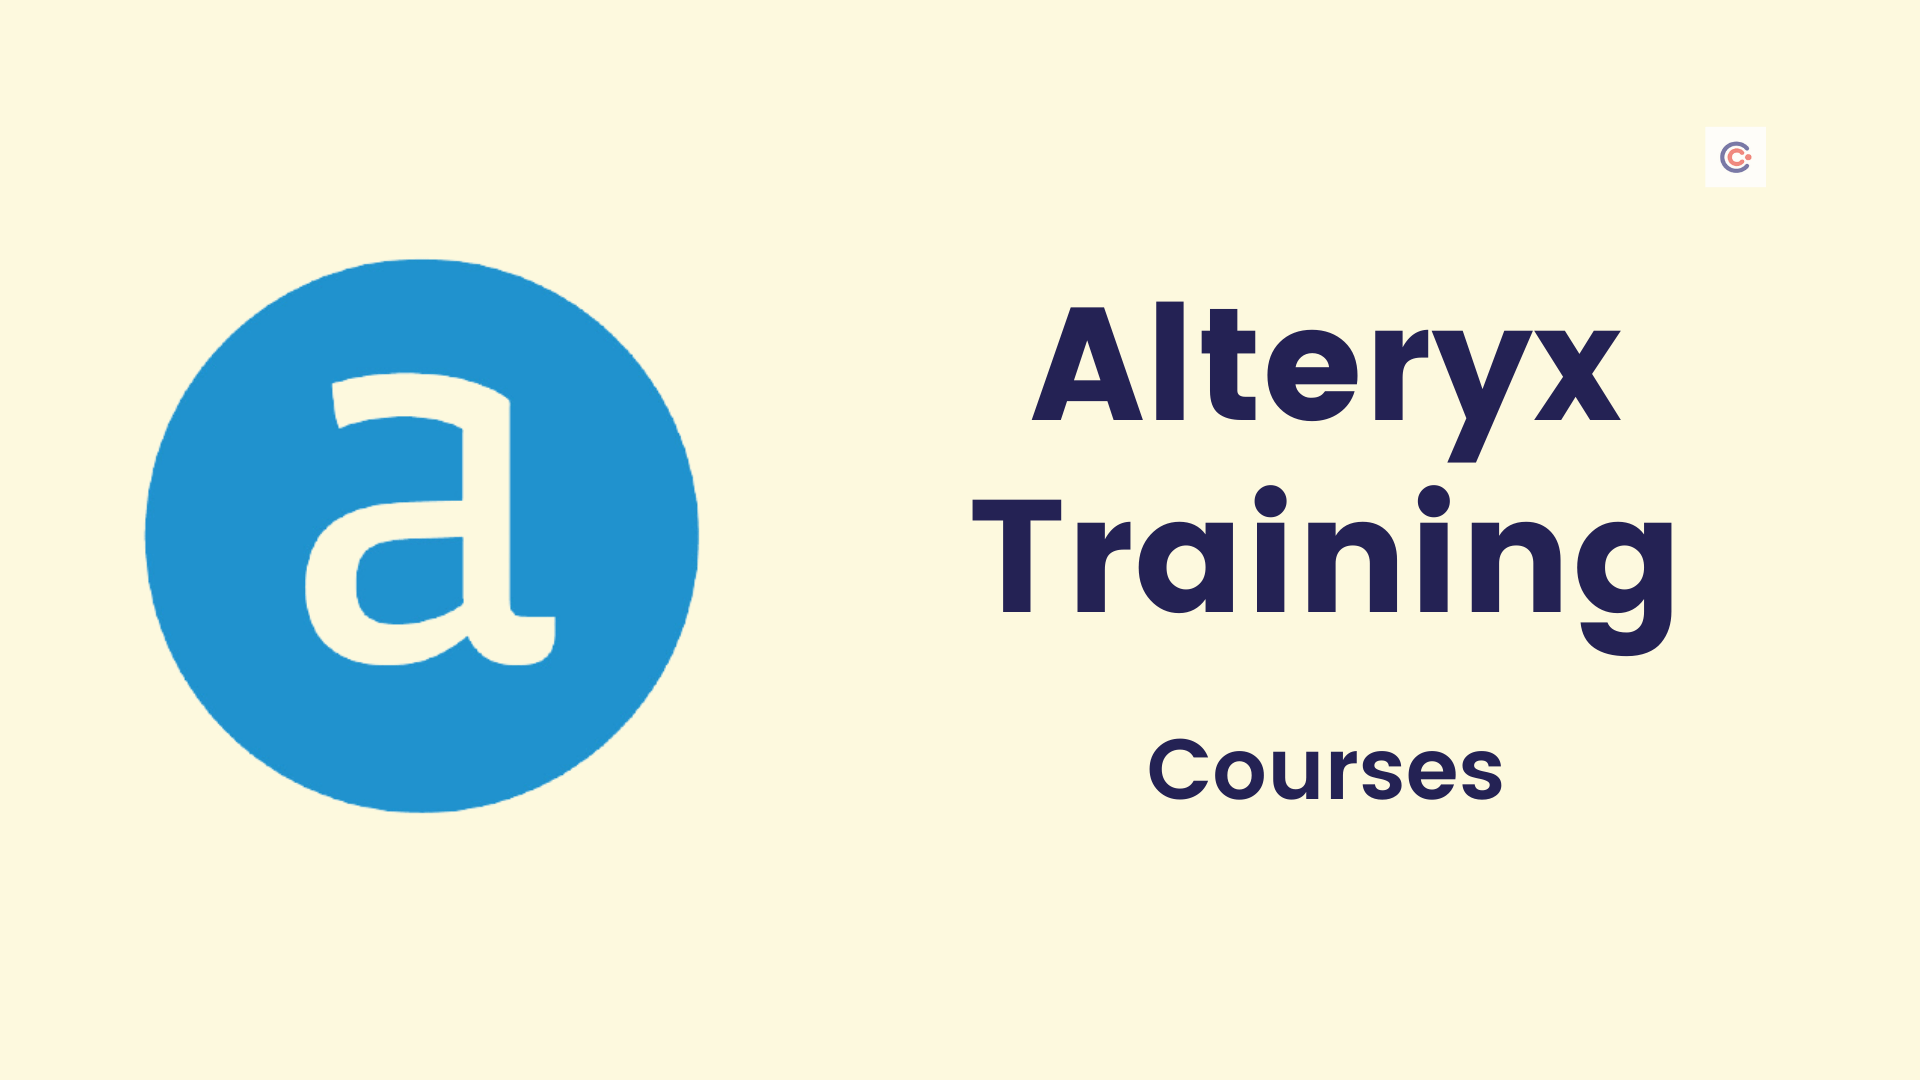 5 Best Alteryx Training Courses - Learn Alteryx Online